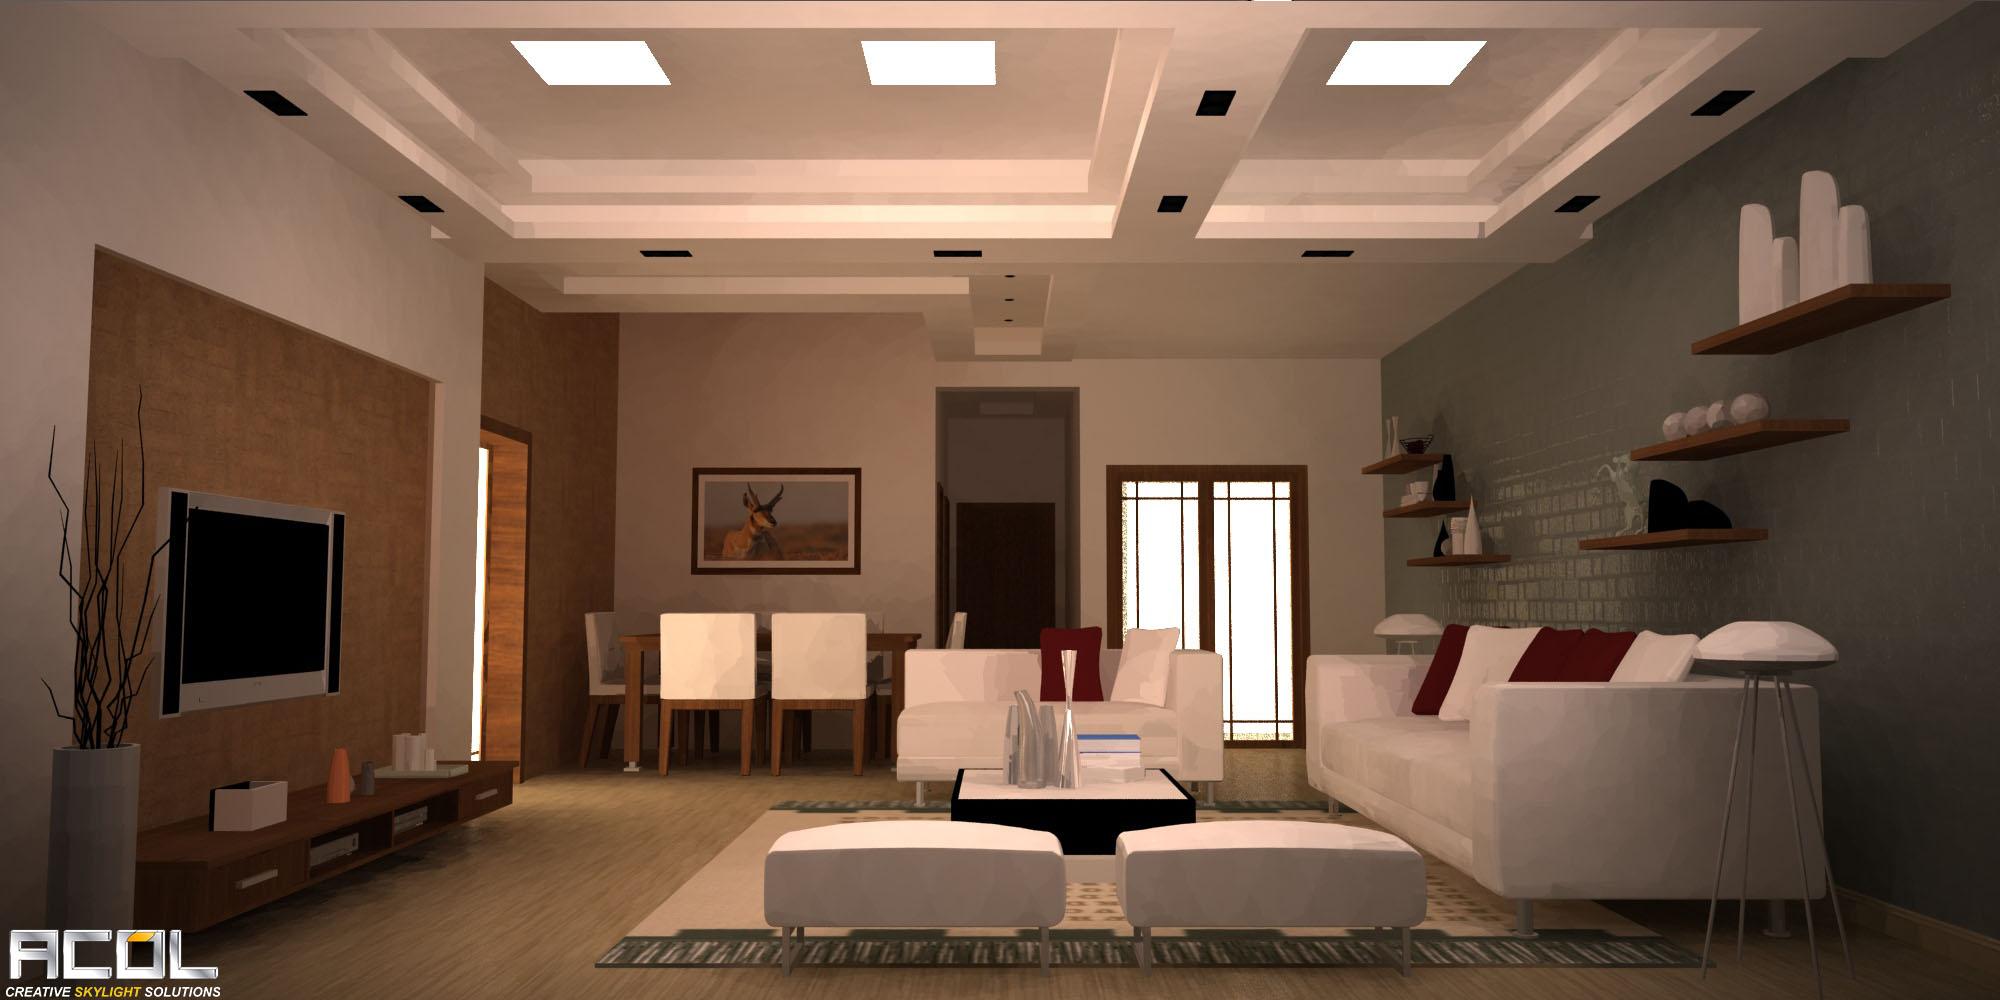 Lounge 3 Square Skylights.jpg